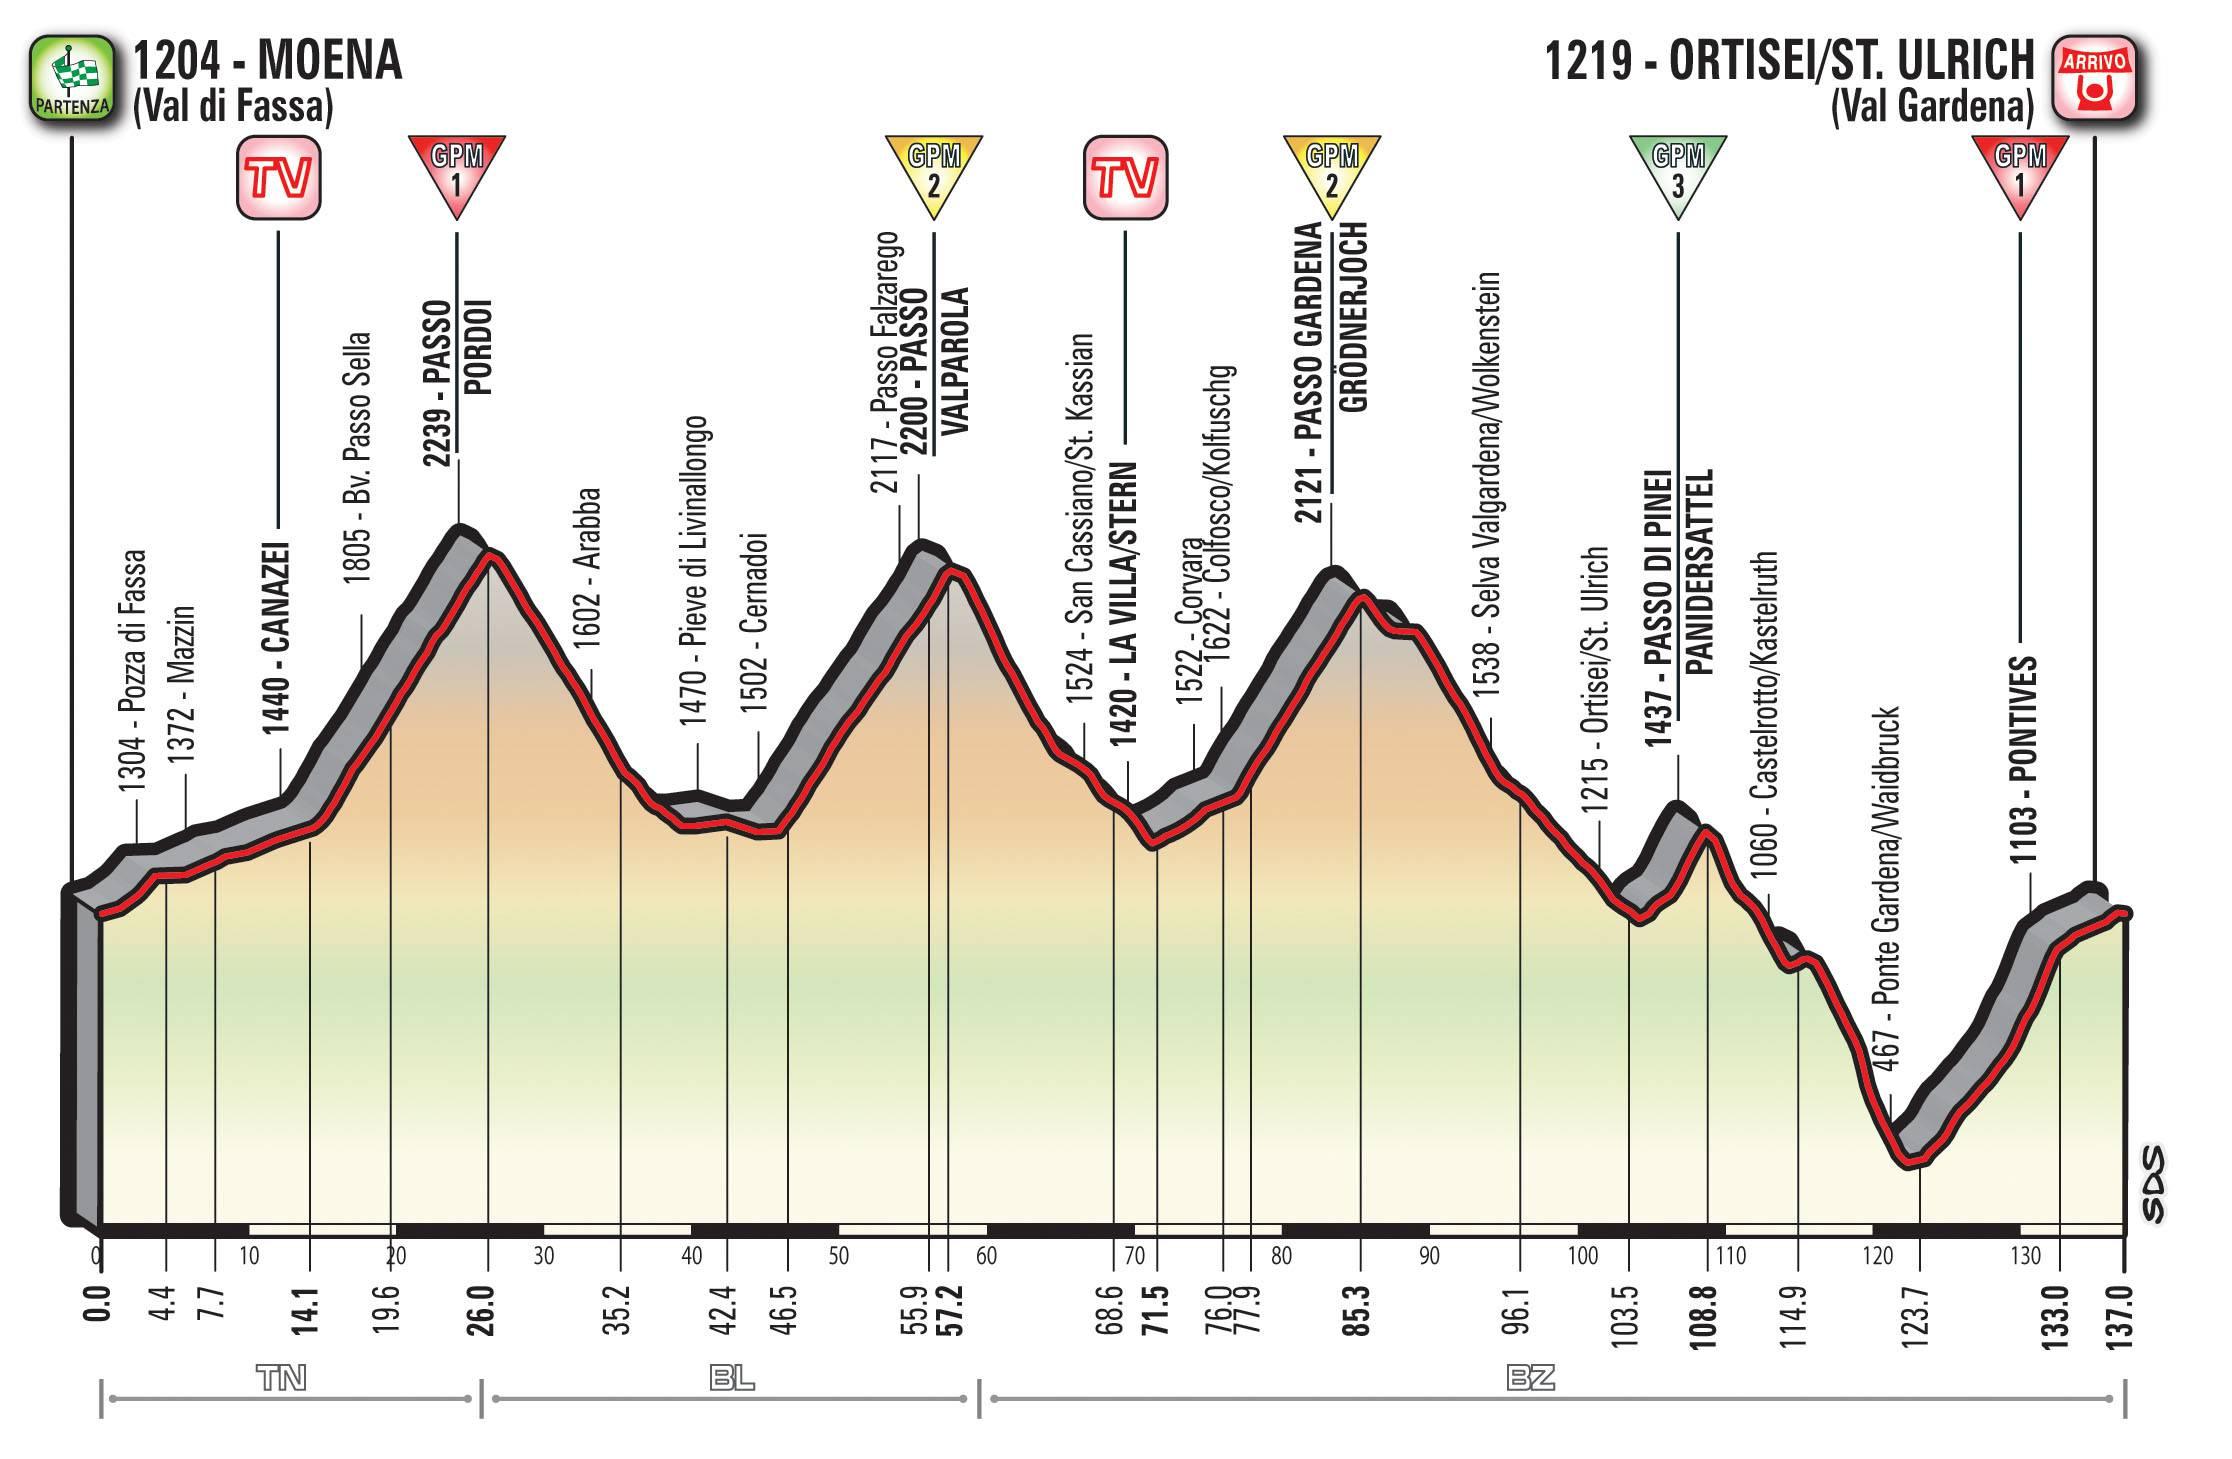 Giro d'Italia 2017, anteprima tappa 18 (Moena-Ortisei)